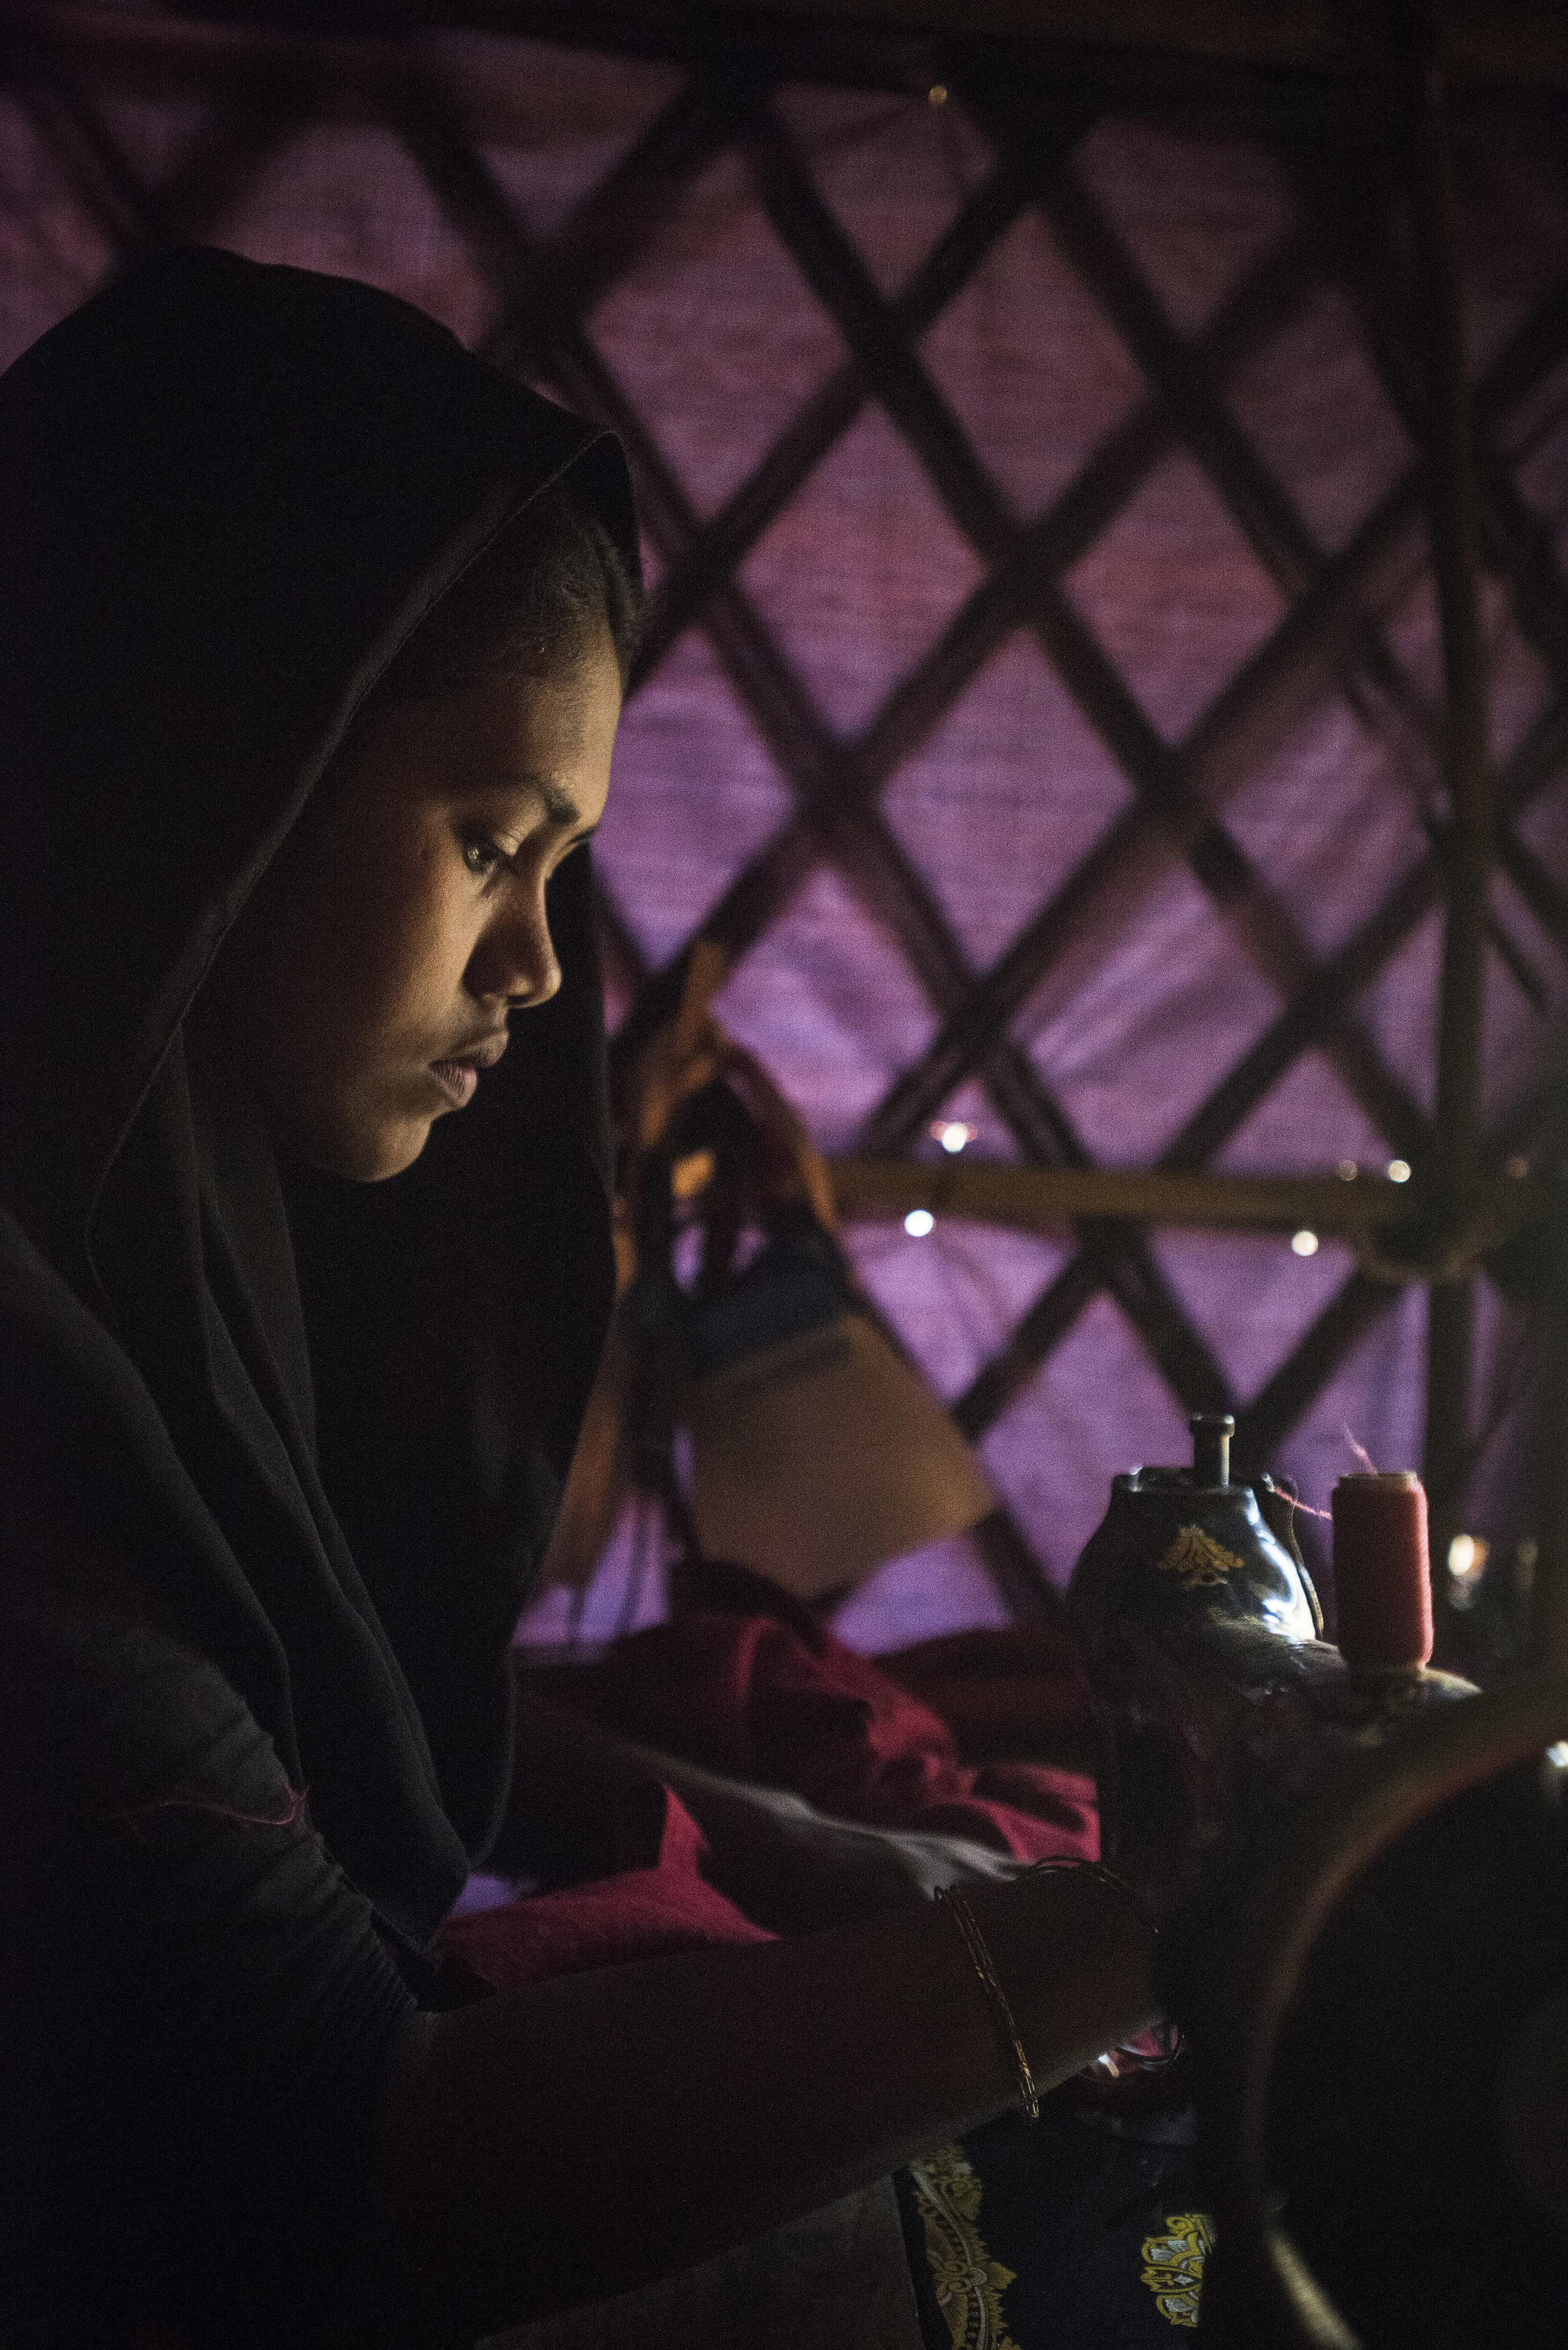 Sewing business, Kutupalong Refugee Camp. Cox's Bazar, Bangladesh. 2018.